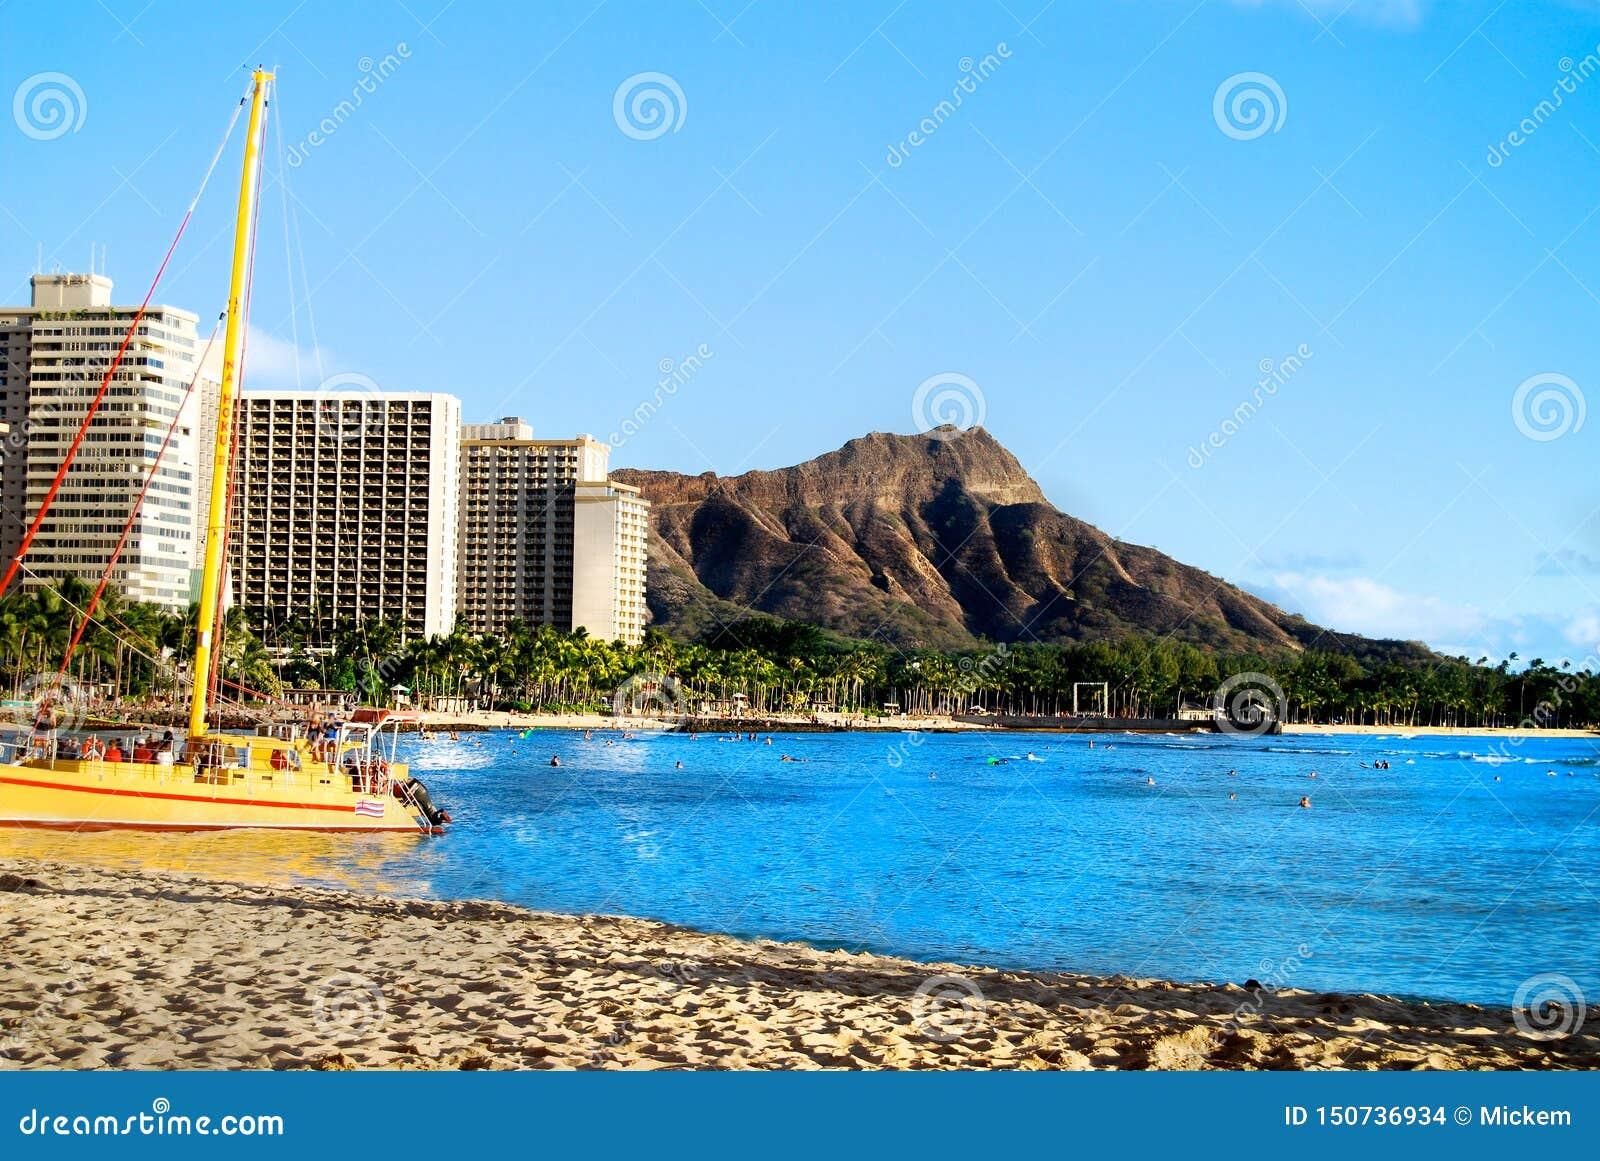 Waikiki Beach With View Of Diamond Head Hawaii Oahu